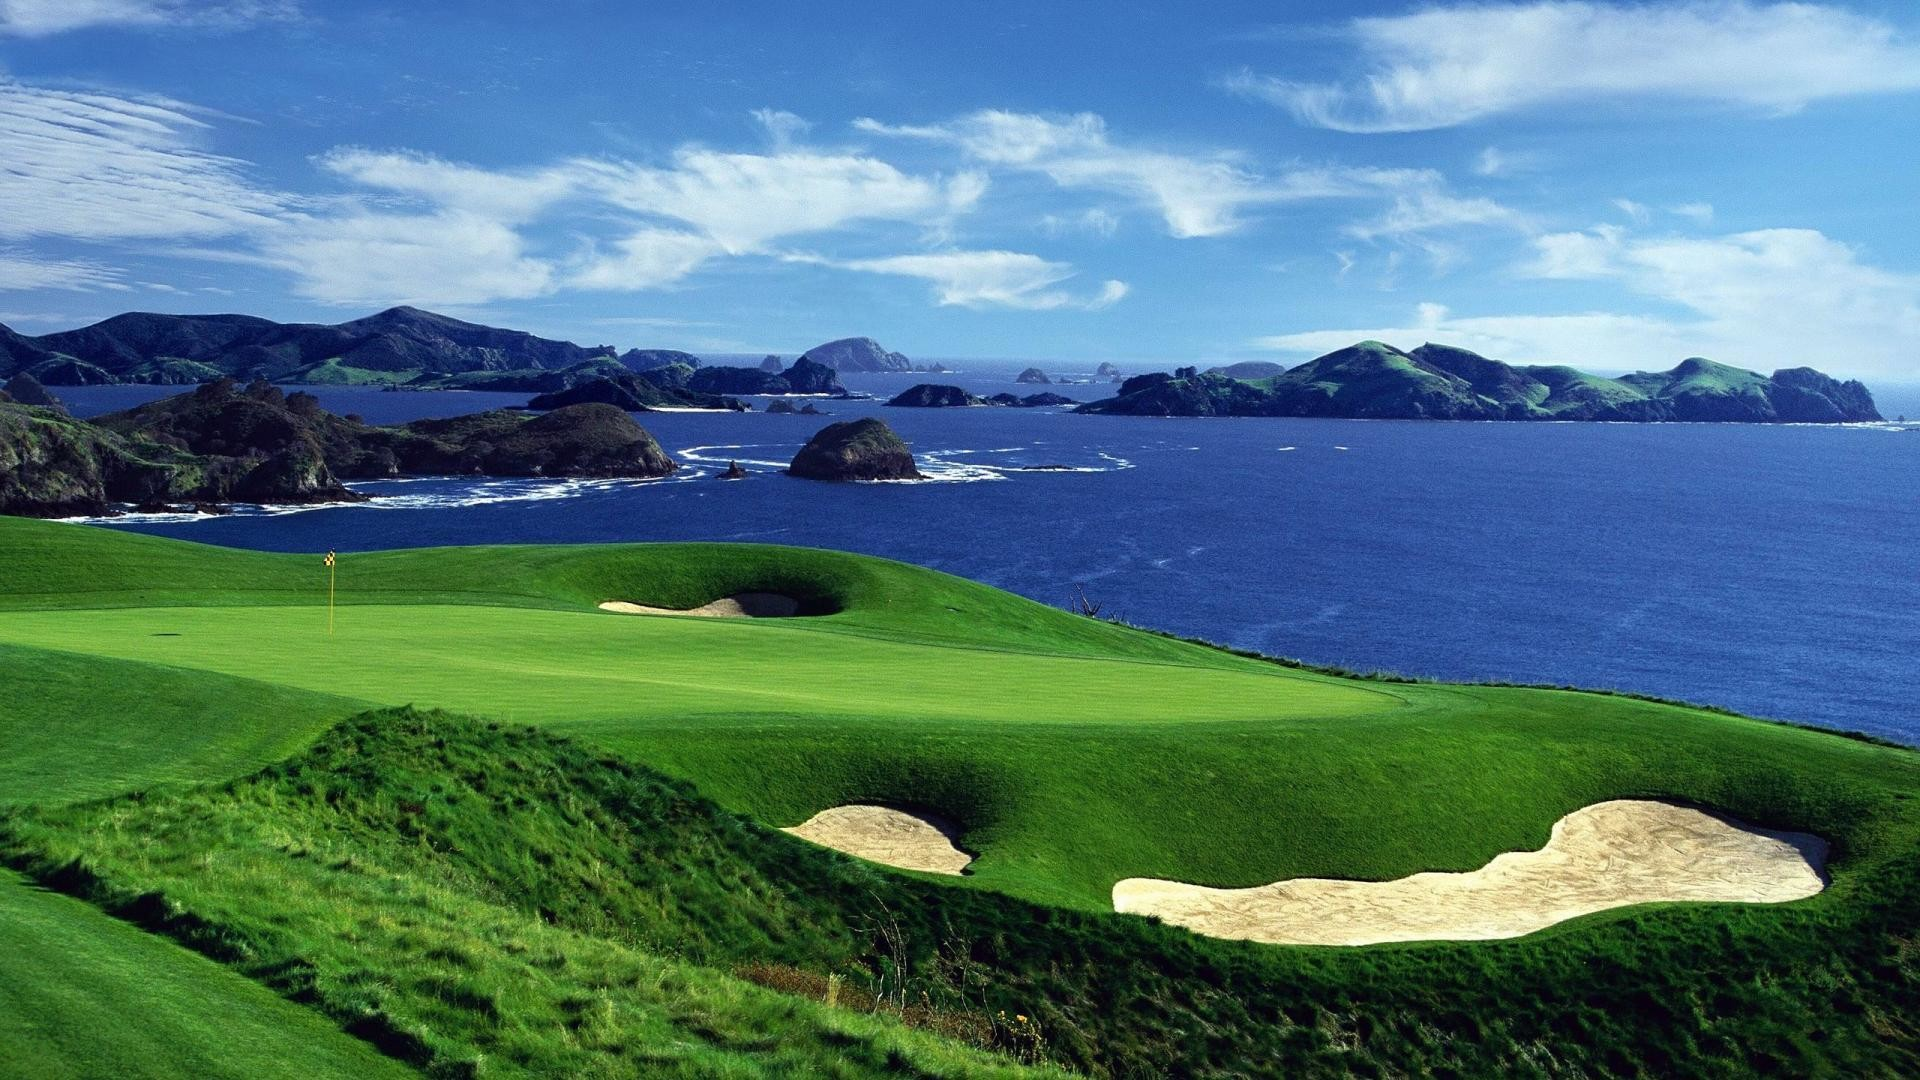 Wallpapers For > Hd Golf Desktop Wallpaper